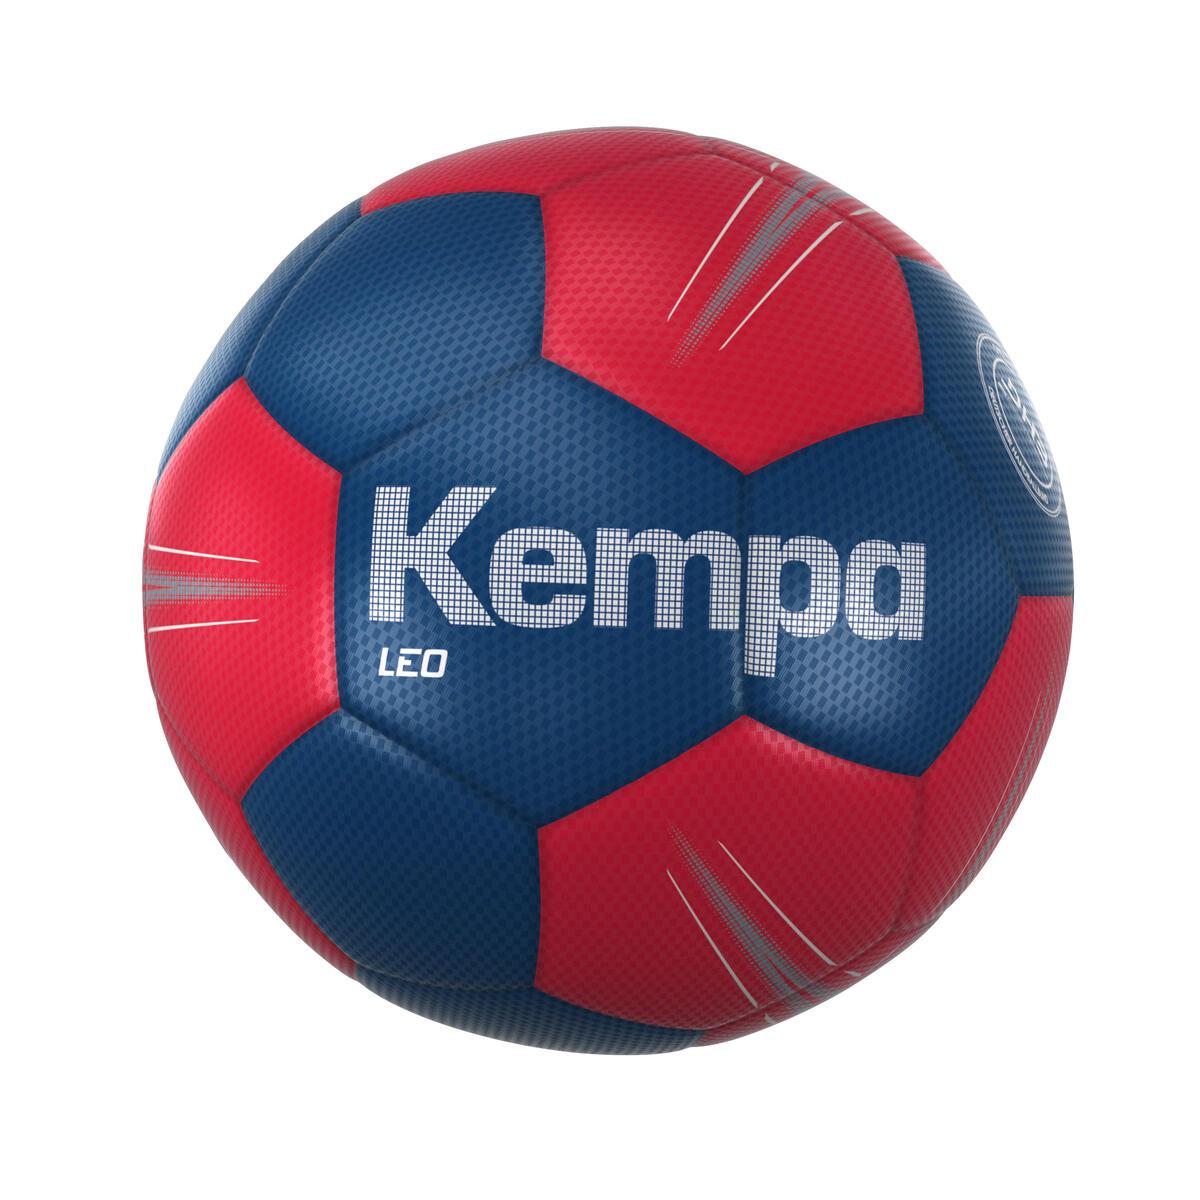 Lækker Kempa Leo håndbold str. 0 - Lekolar Danmark DL-95